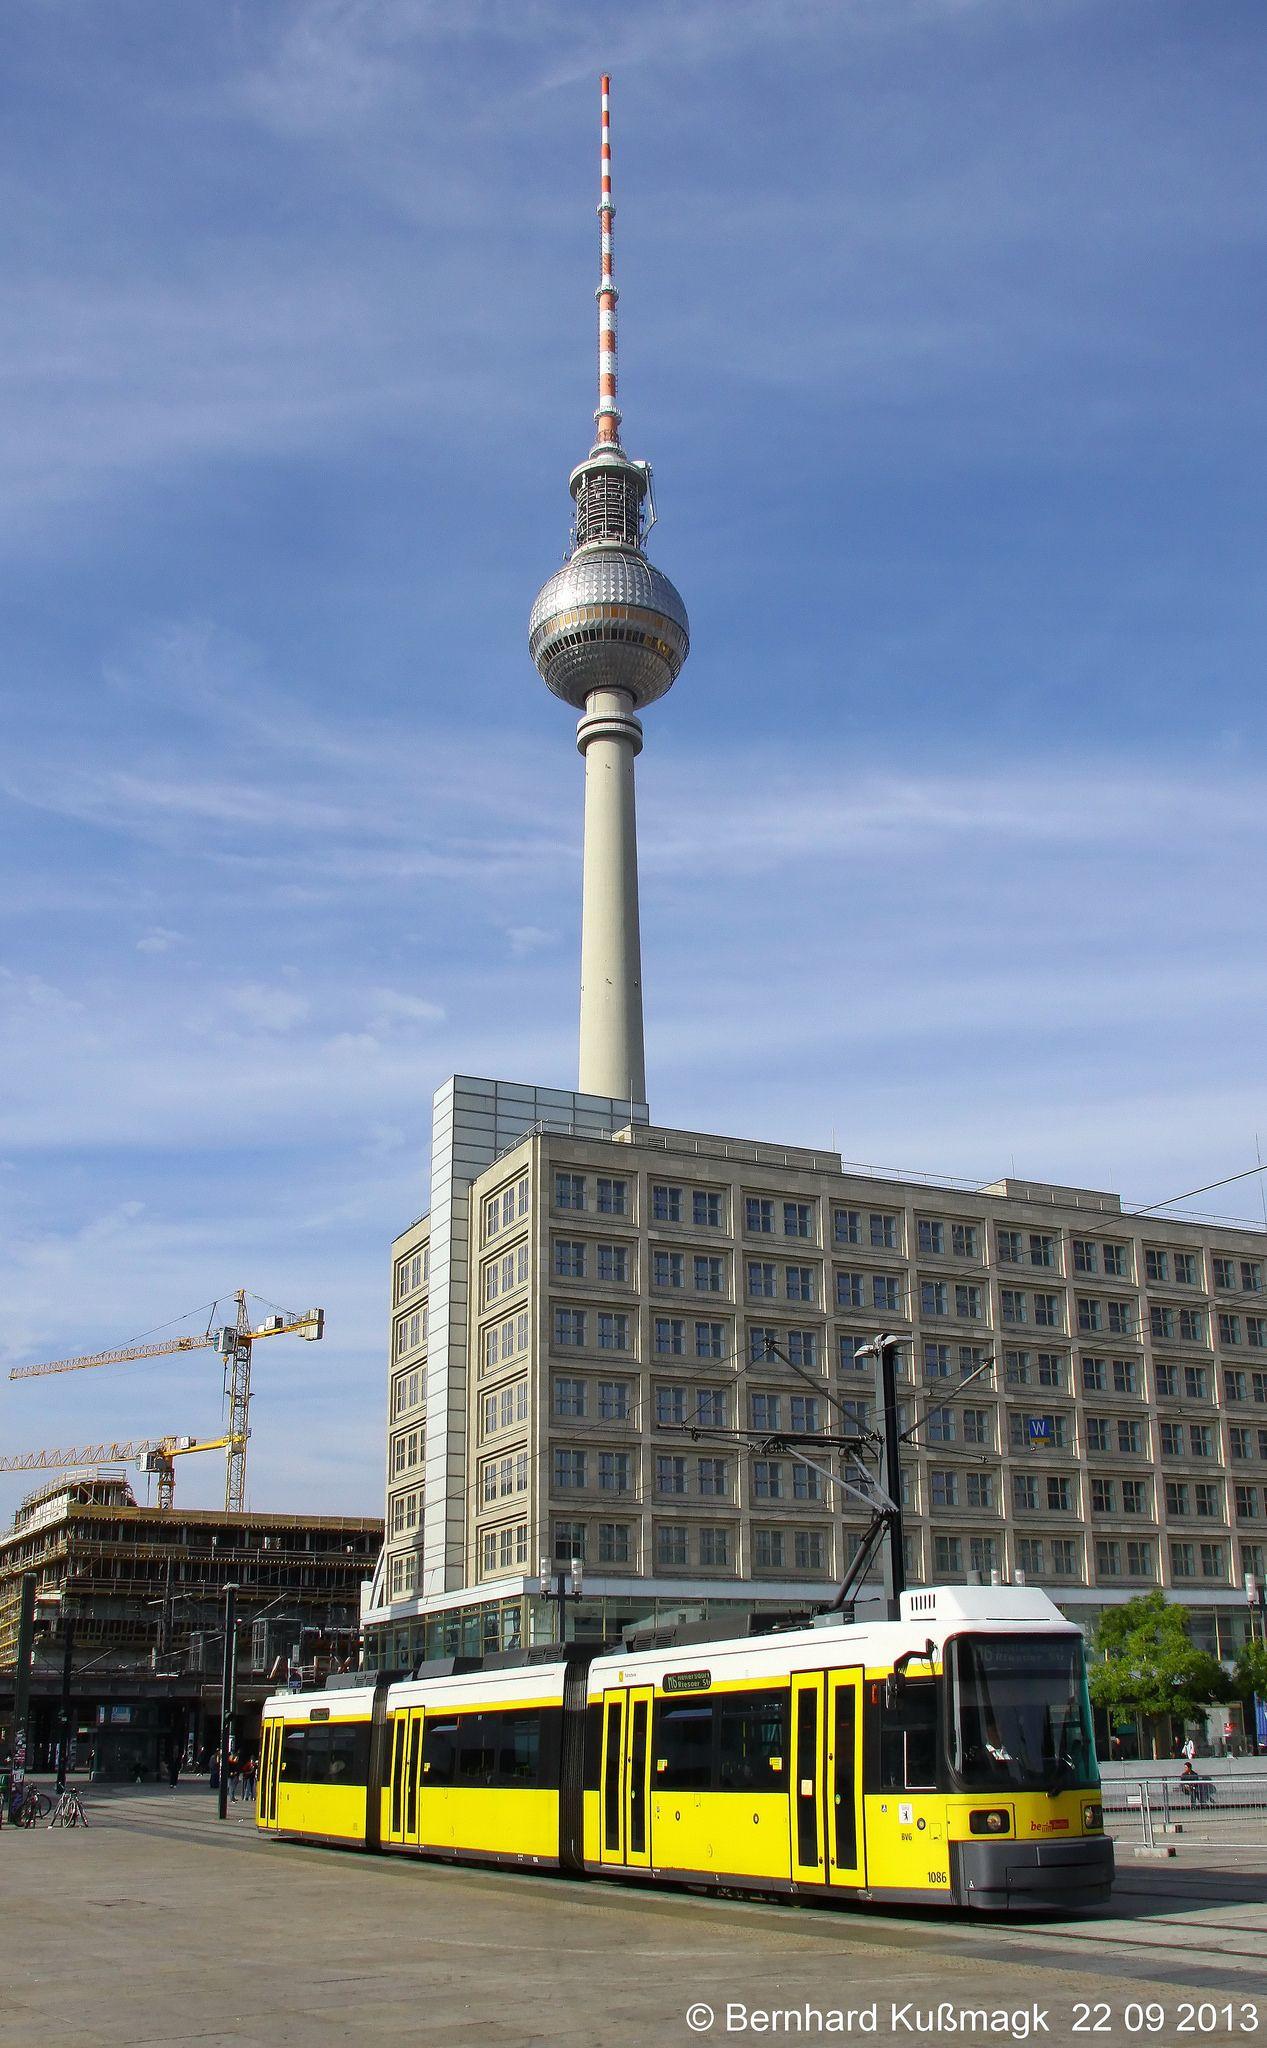 Europa Deutschland Berlin Mitte Alexanderplatz Light Rail Public Transport Bay Area Rapid Transit